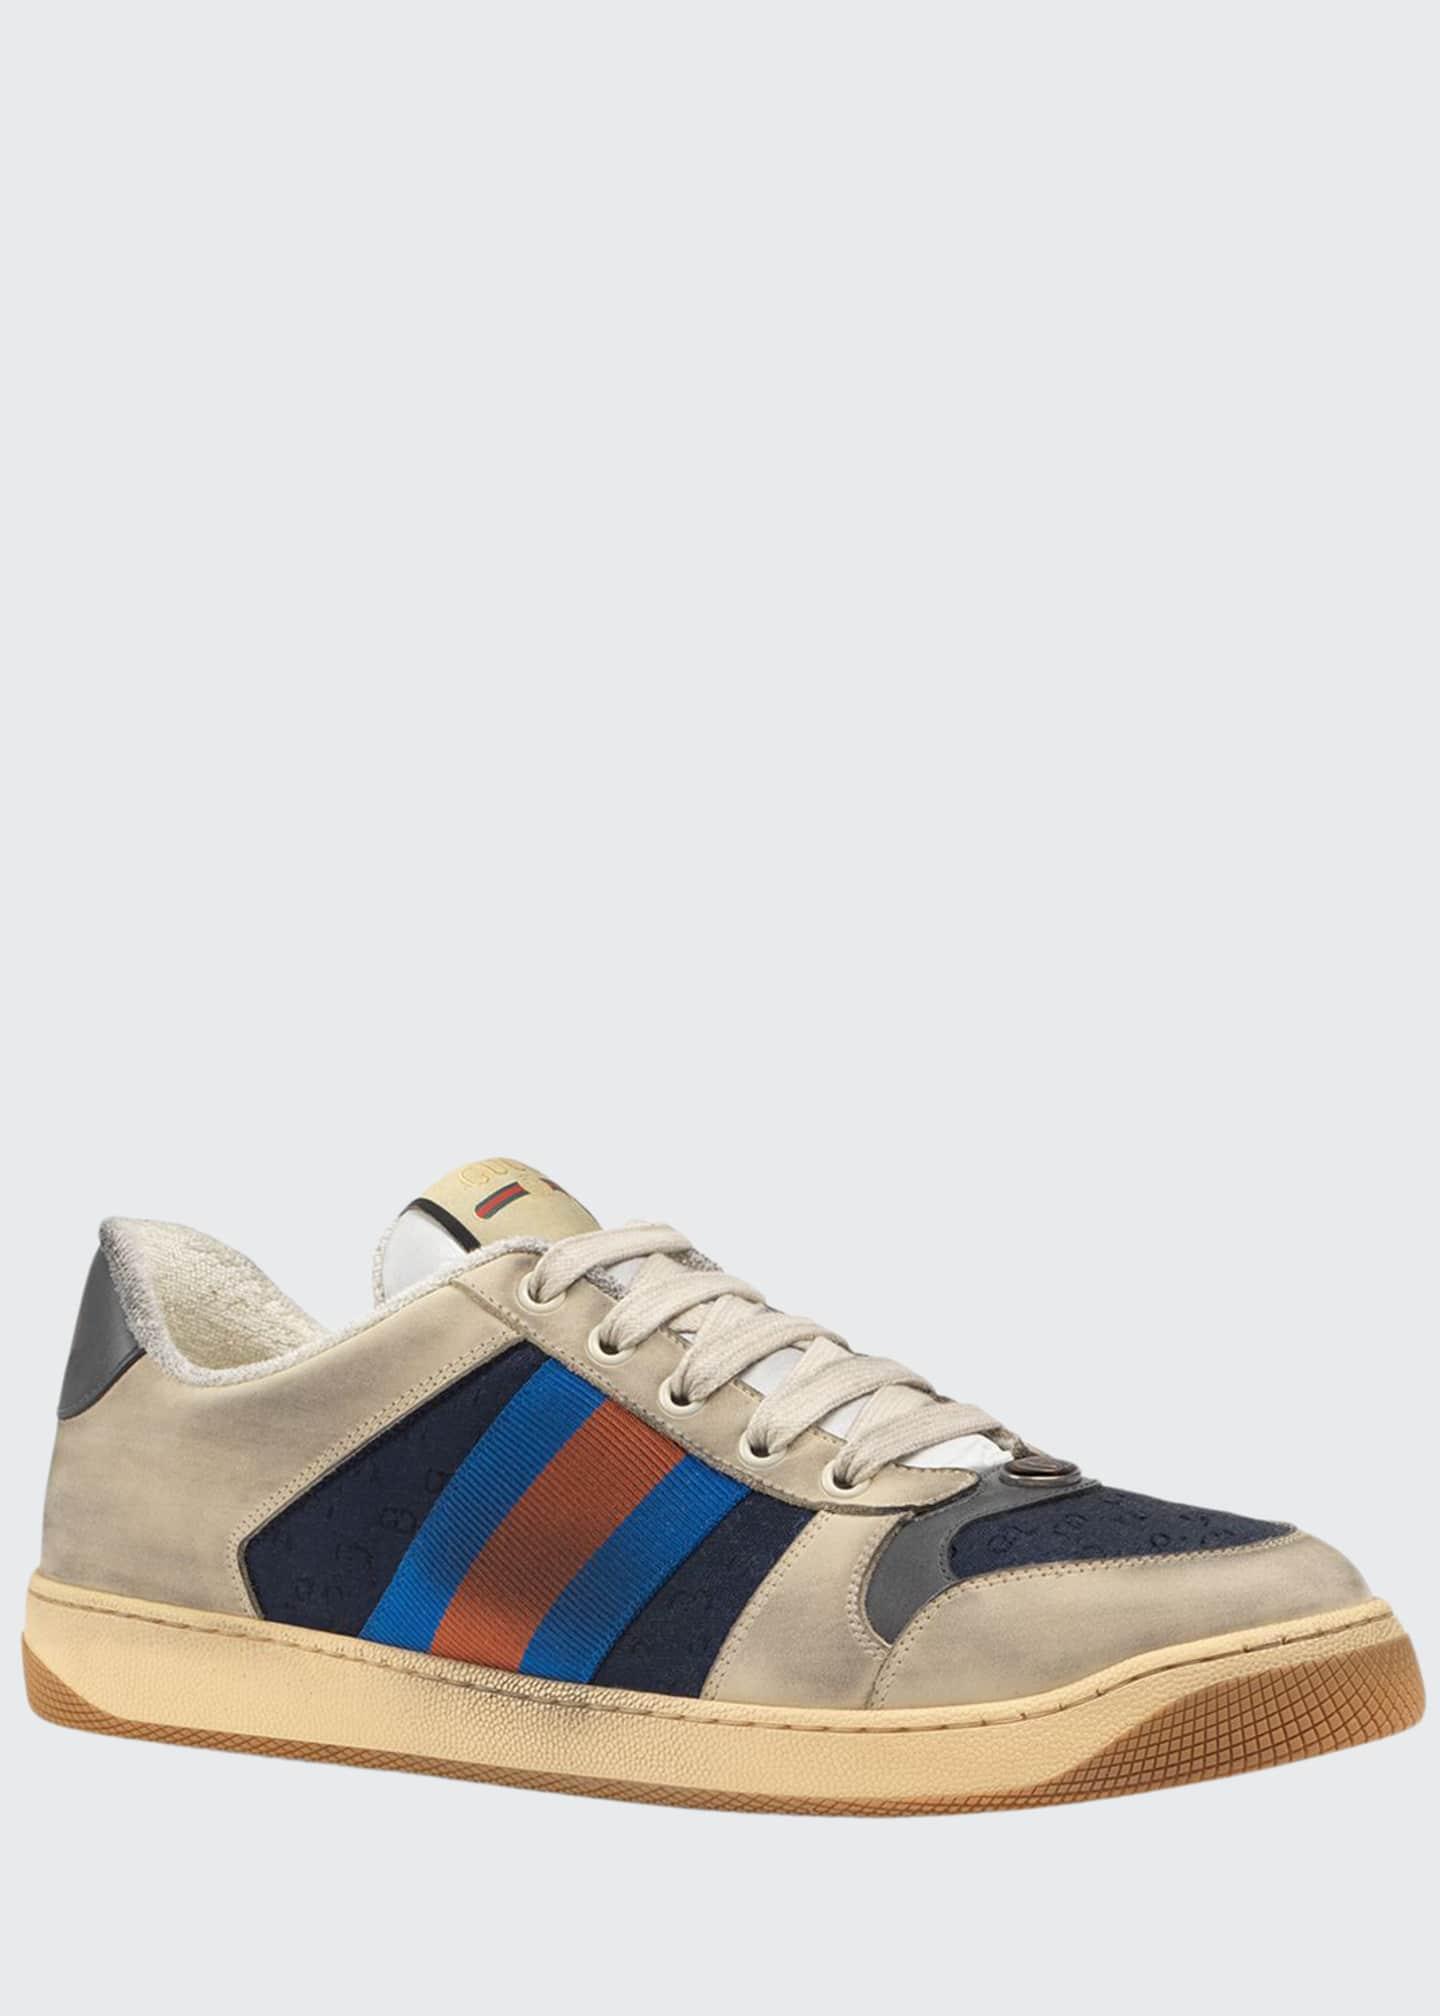 Gucci Men's Screener Distressed Leather Web Sneakers